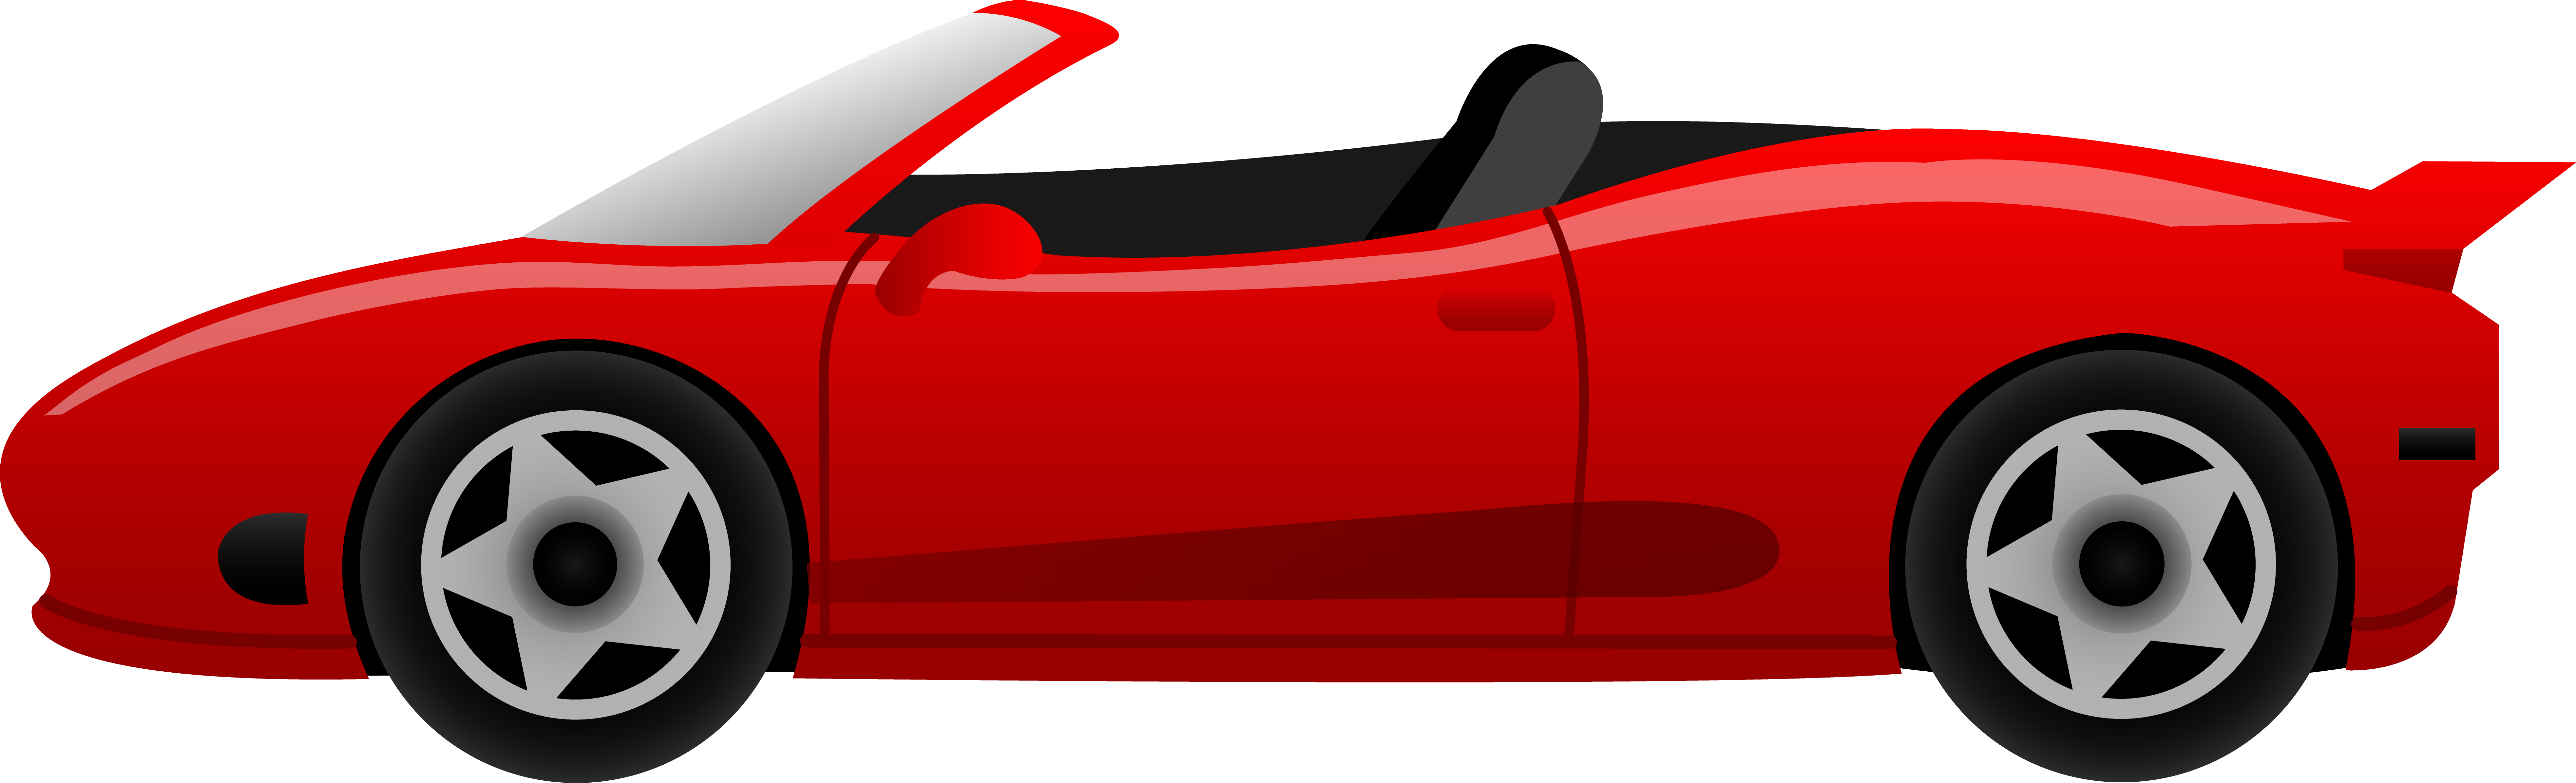 Car clipart #19, Download drawings